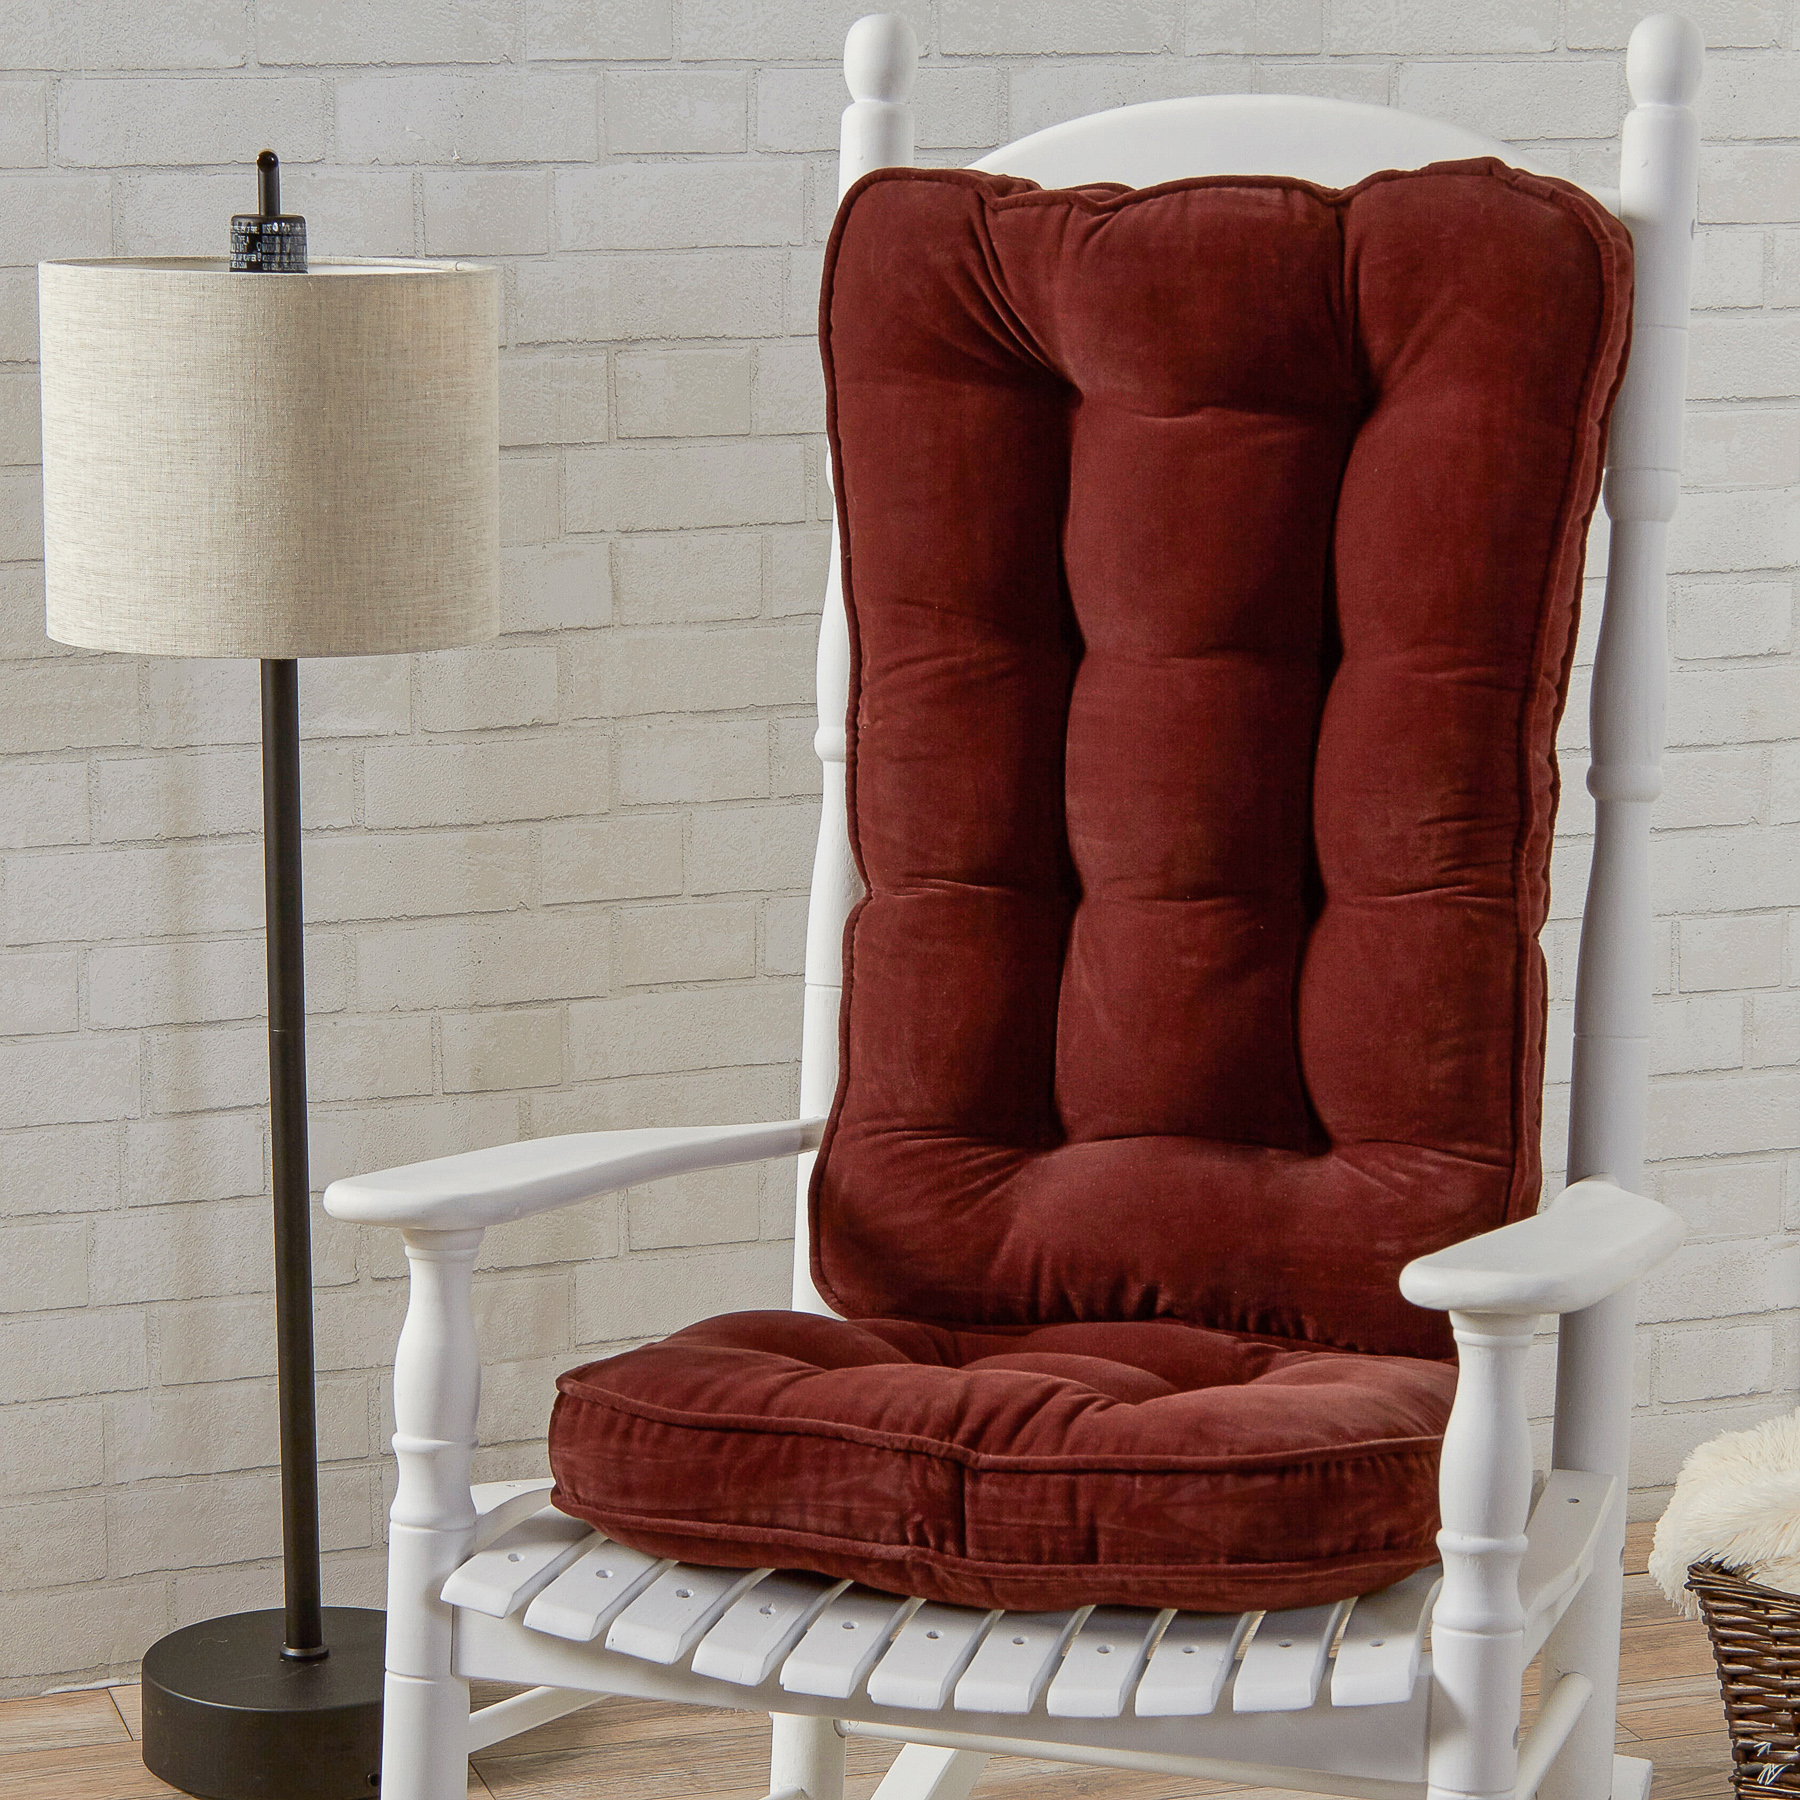 Greendale Home Fashions Hyatt Jumbo Rocking Chair Cushion Set   Burgundy.,  Red